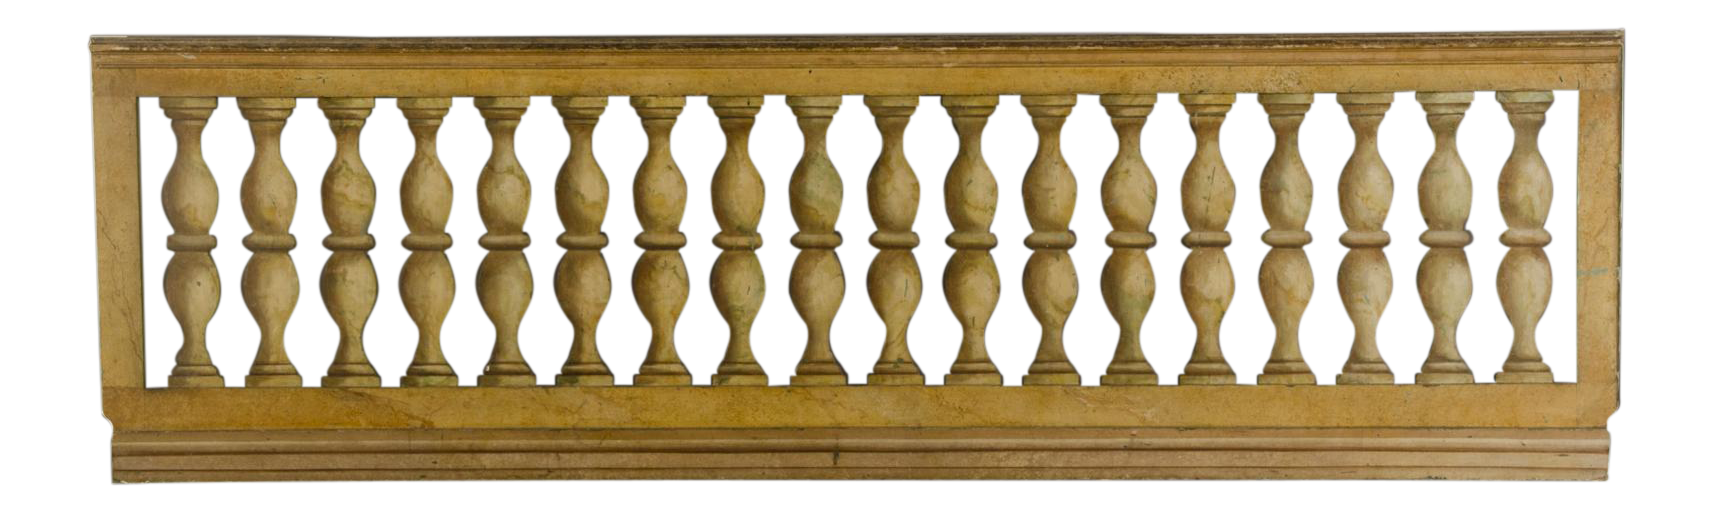 Balustrade png 4 » PNG Image.